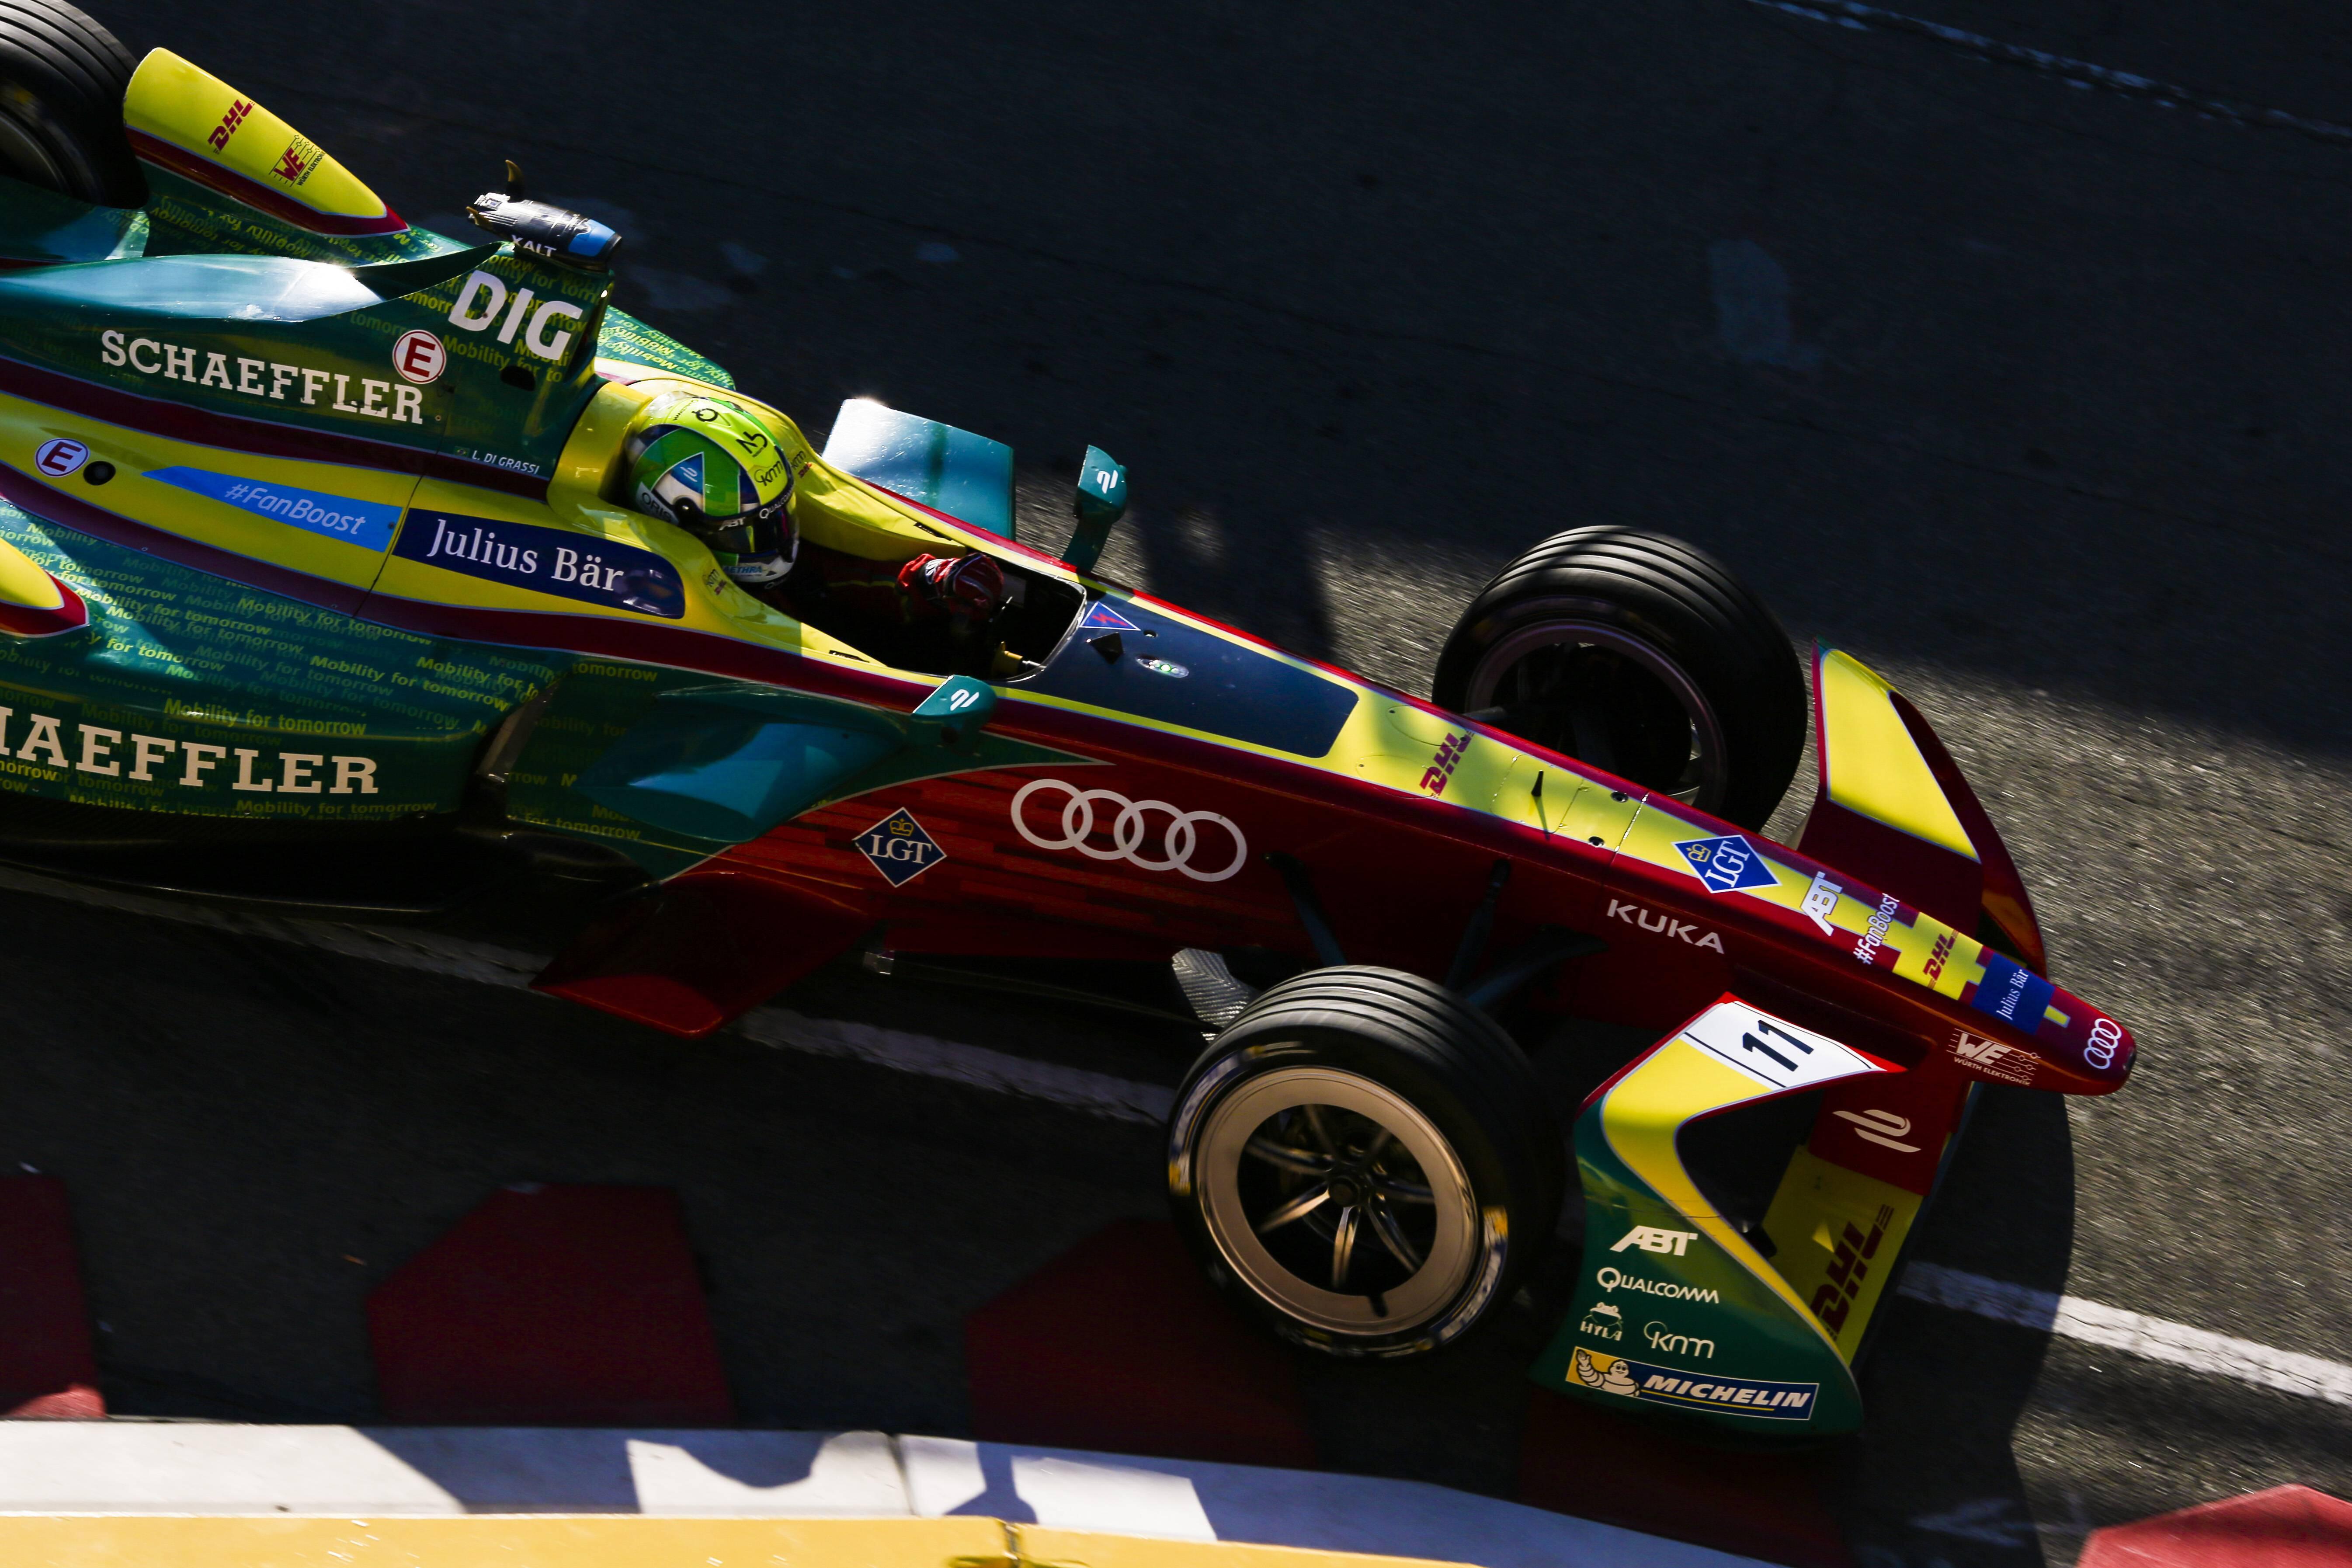 Bild zu Mercedes, Formel E, Formel 1, Nick Heidfeld